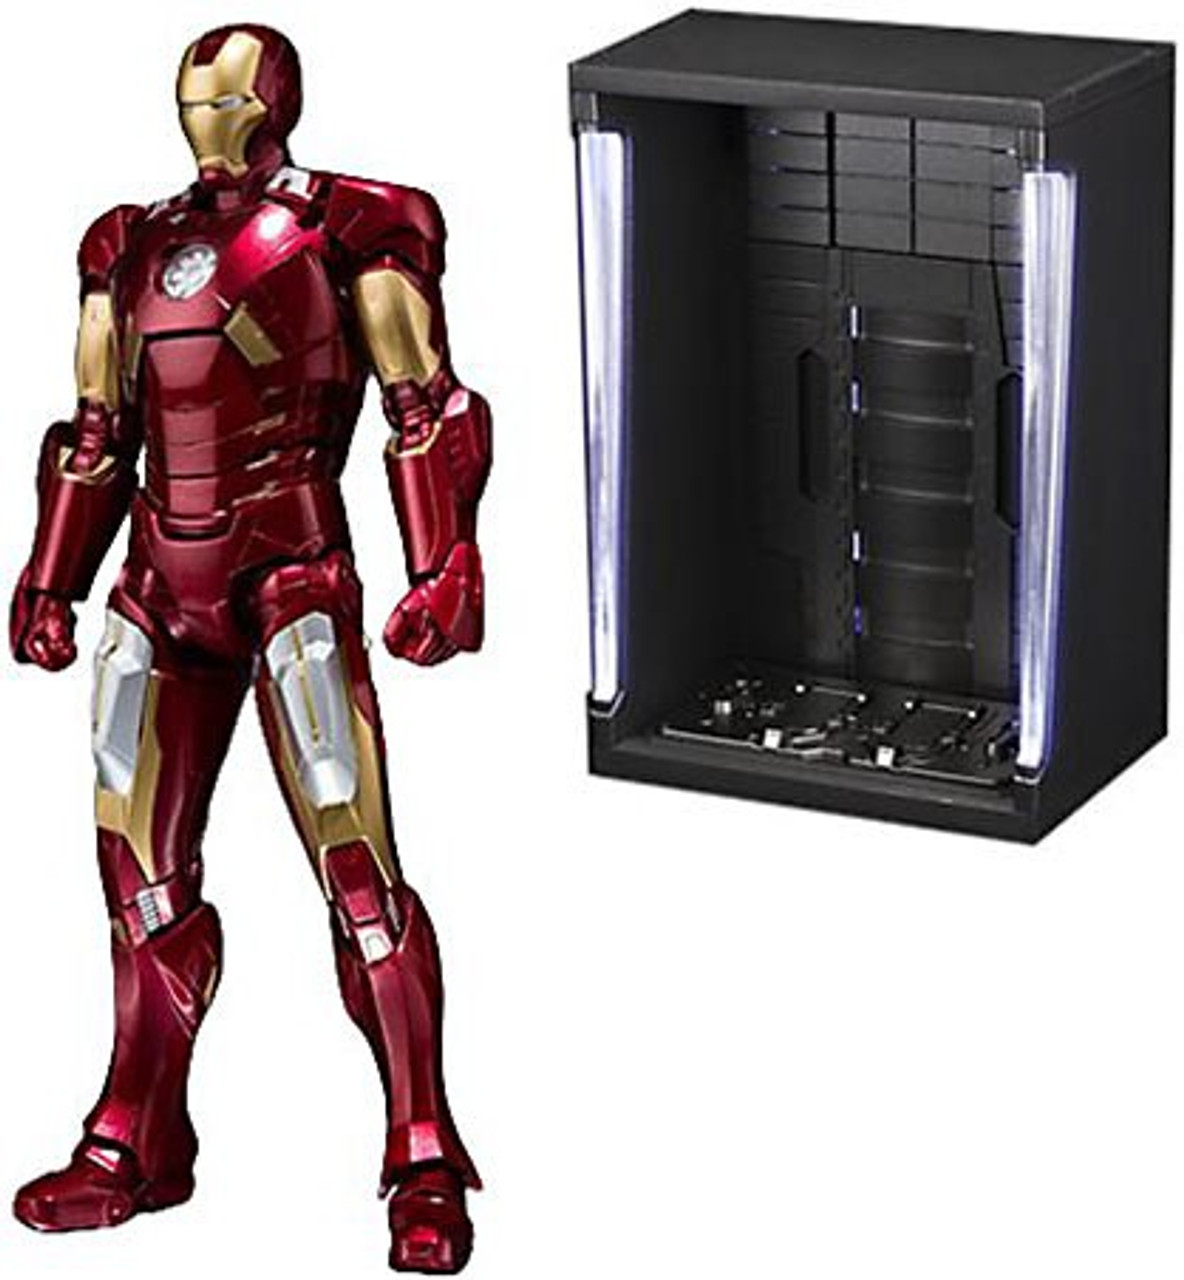 Картинки по запросу S.H.Figuarts Figures - Marvel - Iron Man Mark VII And Hall Of Armor Set